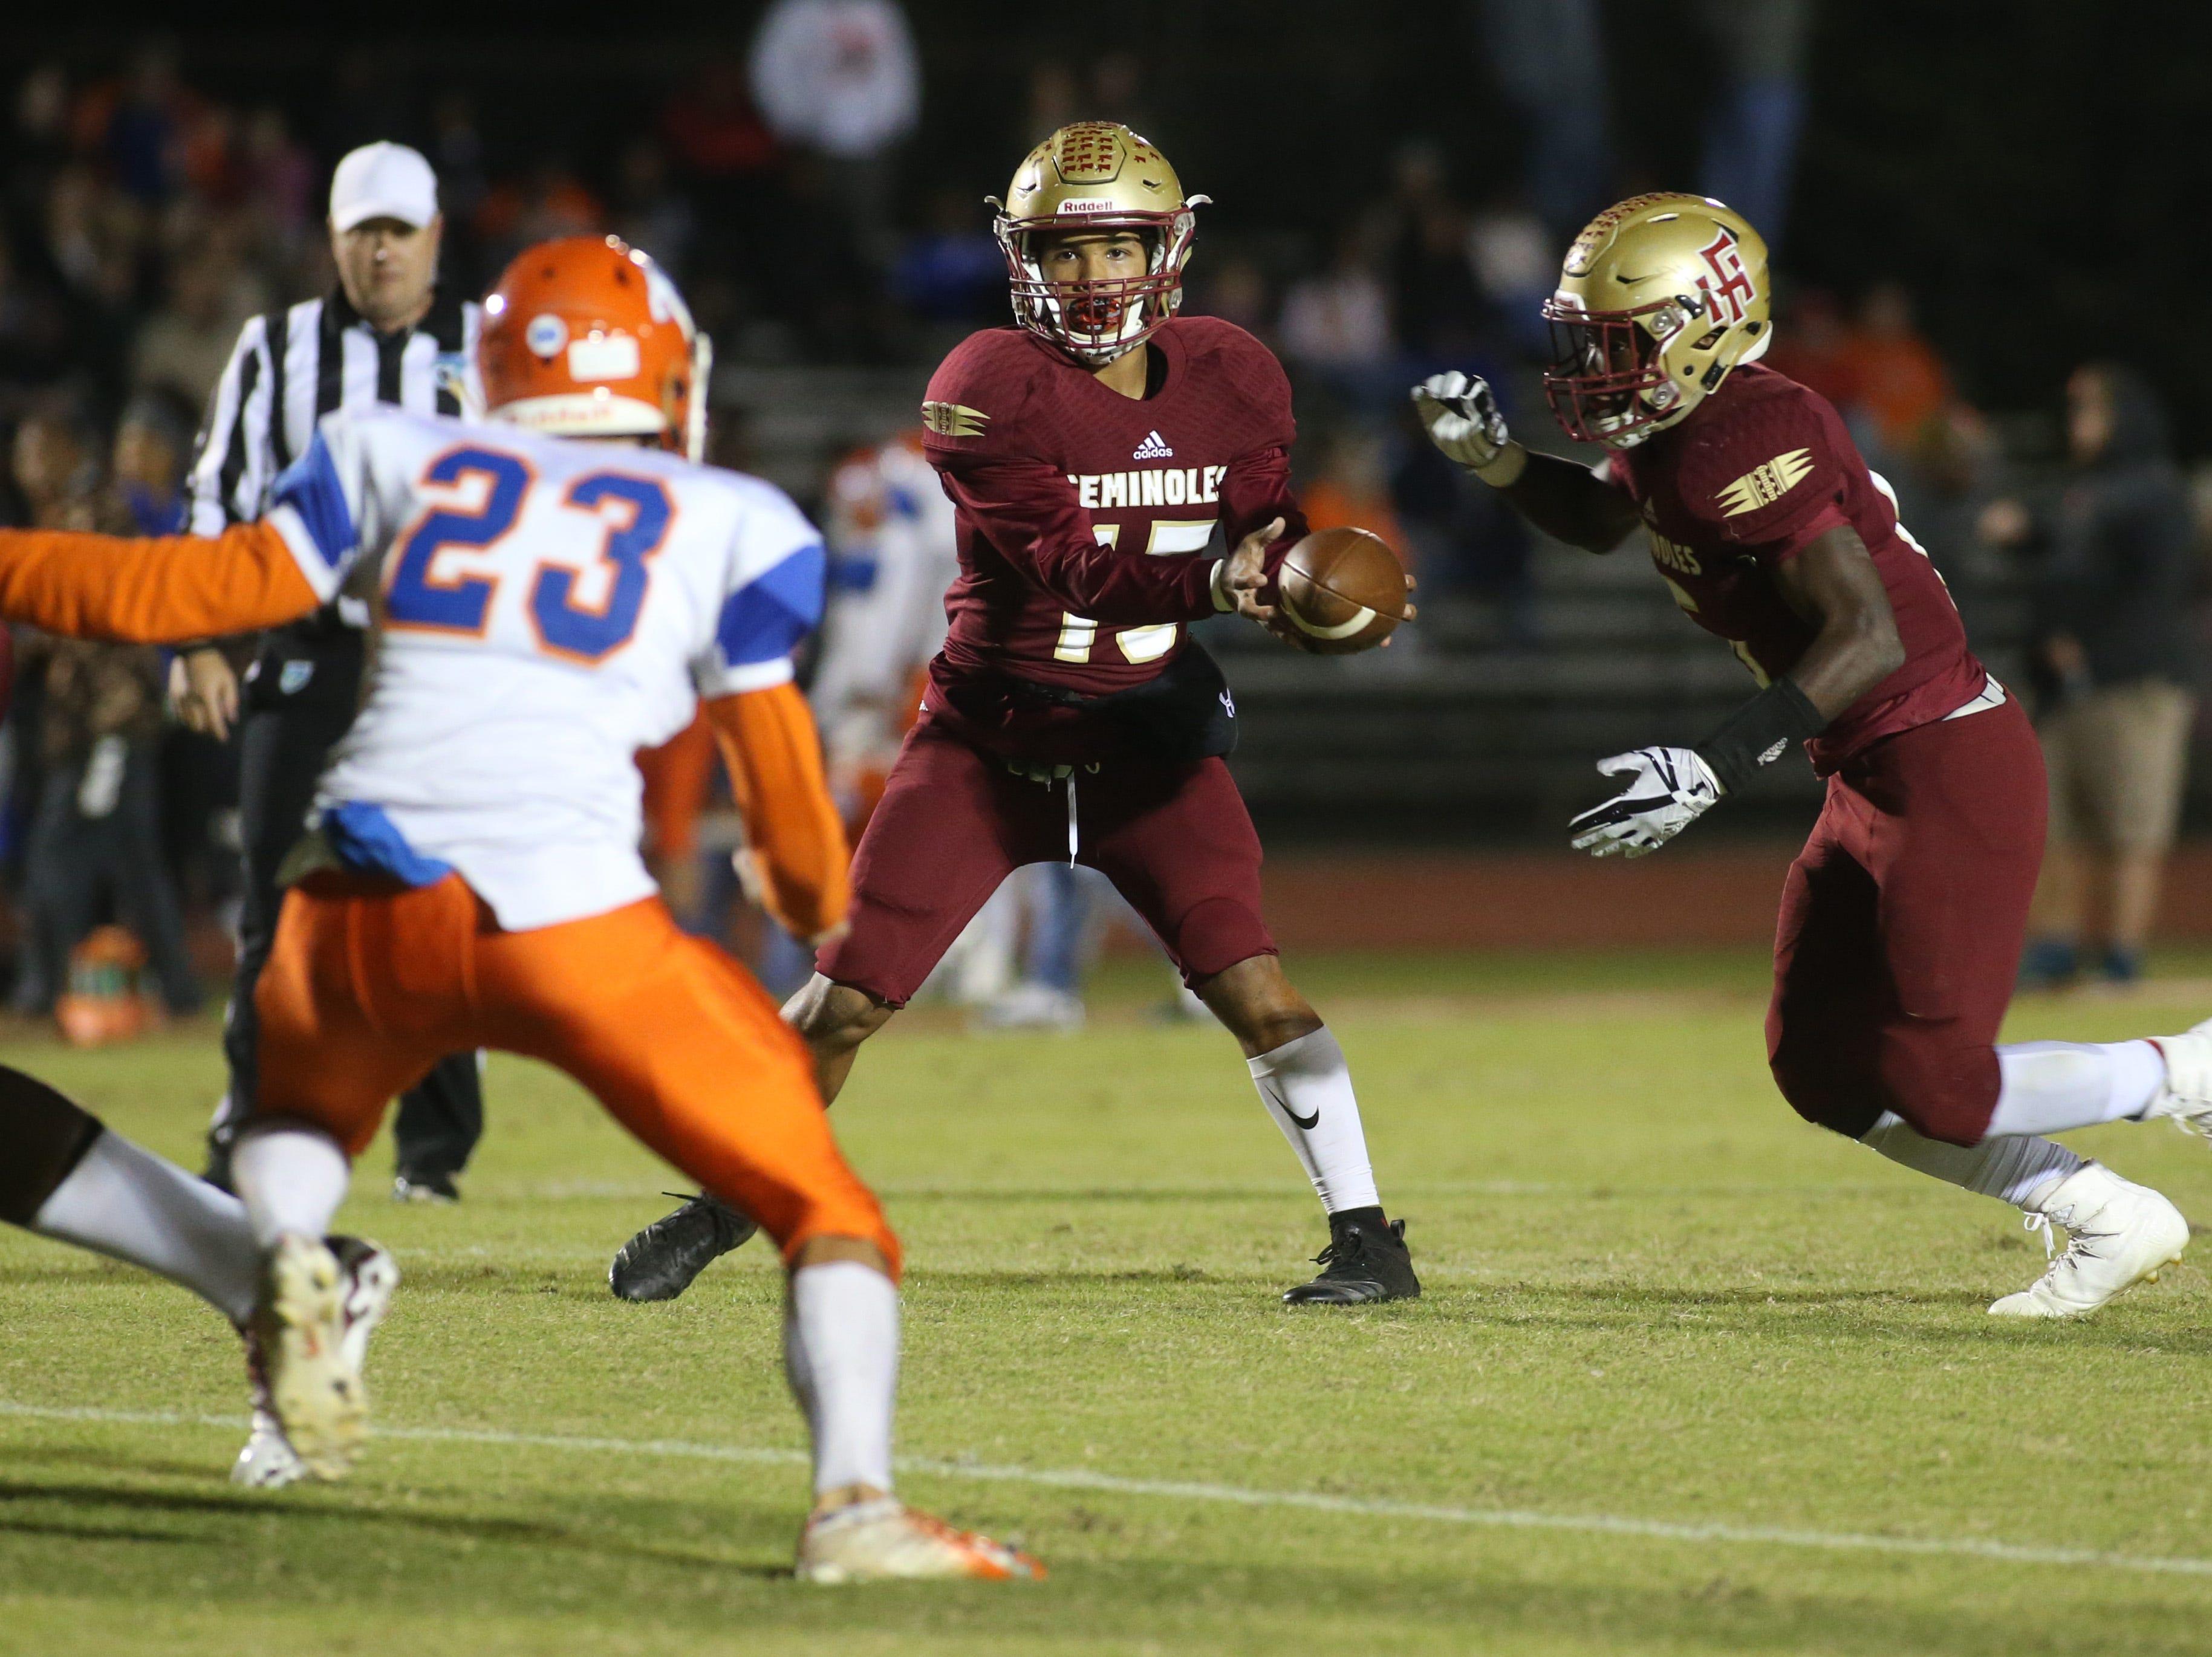 Florida High Seminole quarterback Bryson Hill (15) hands off the ball as the Taylor County Bulldogs play the Florida High Seminoles in a Region 1-3A final on Friday, Nov. 23, 2018.